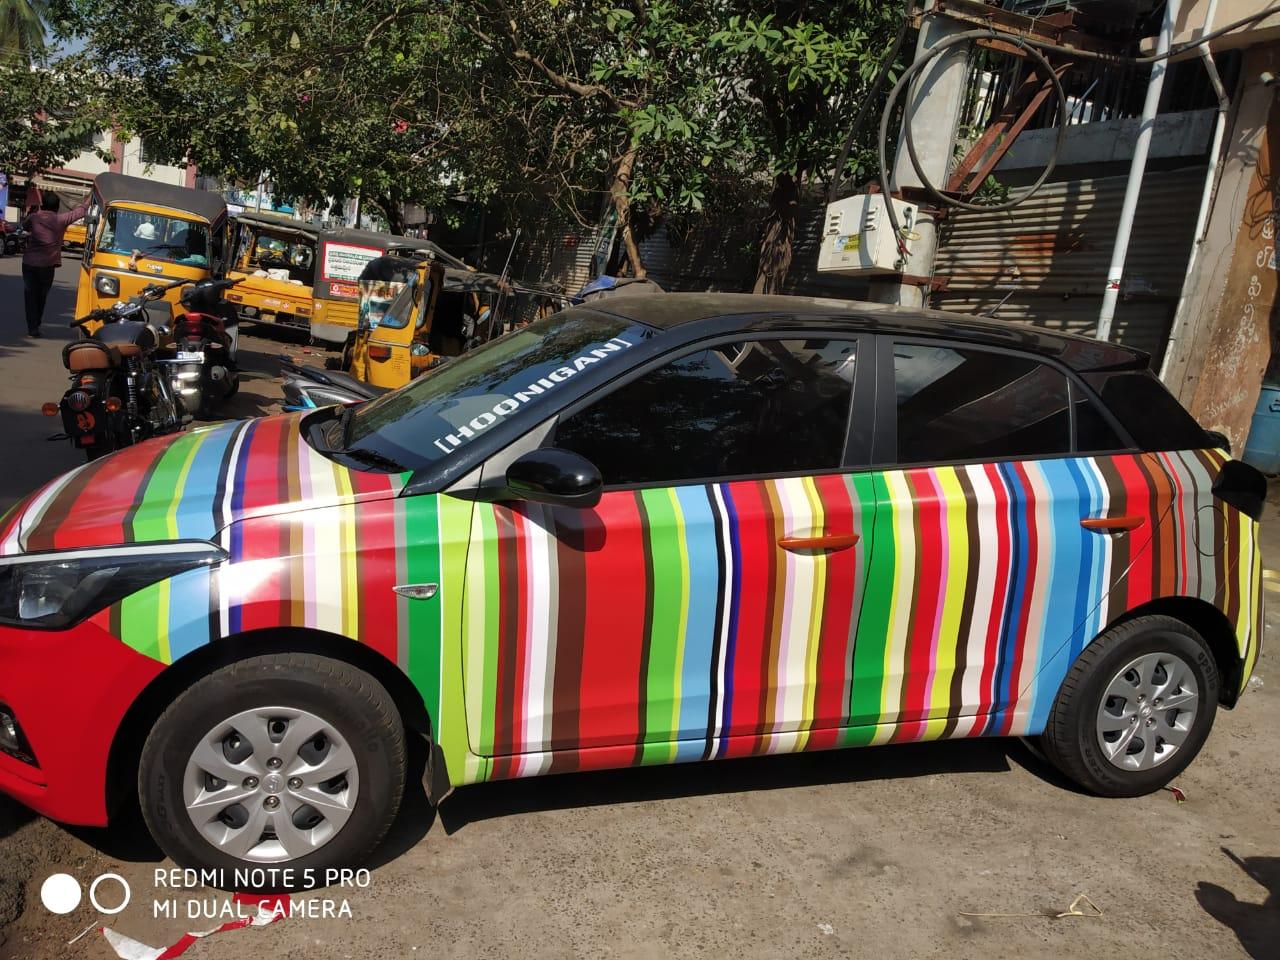 I20 accessories modified · elite i20 vinyl wrap car wrapping sticker car accessories modified